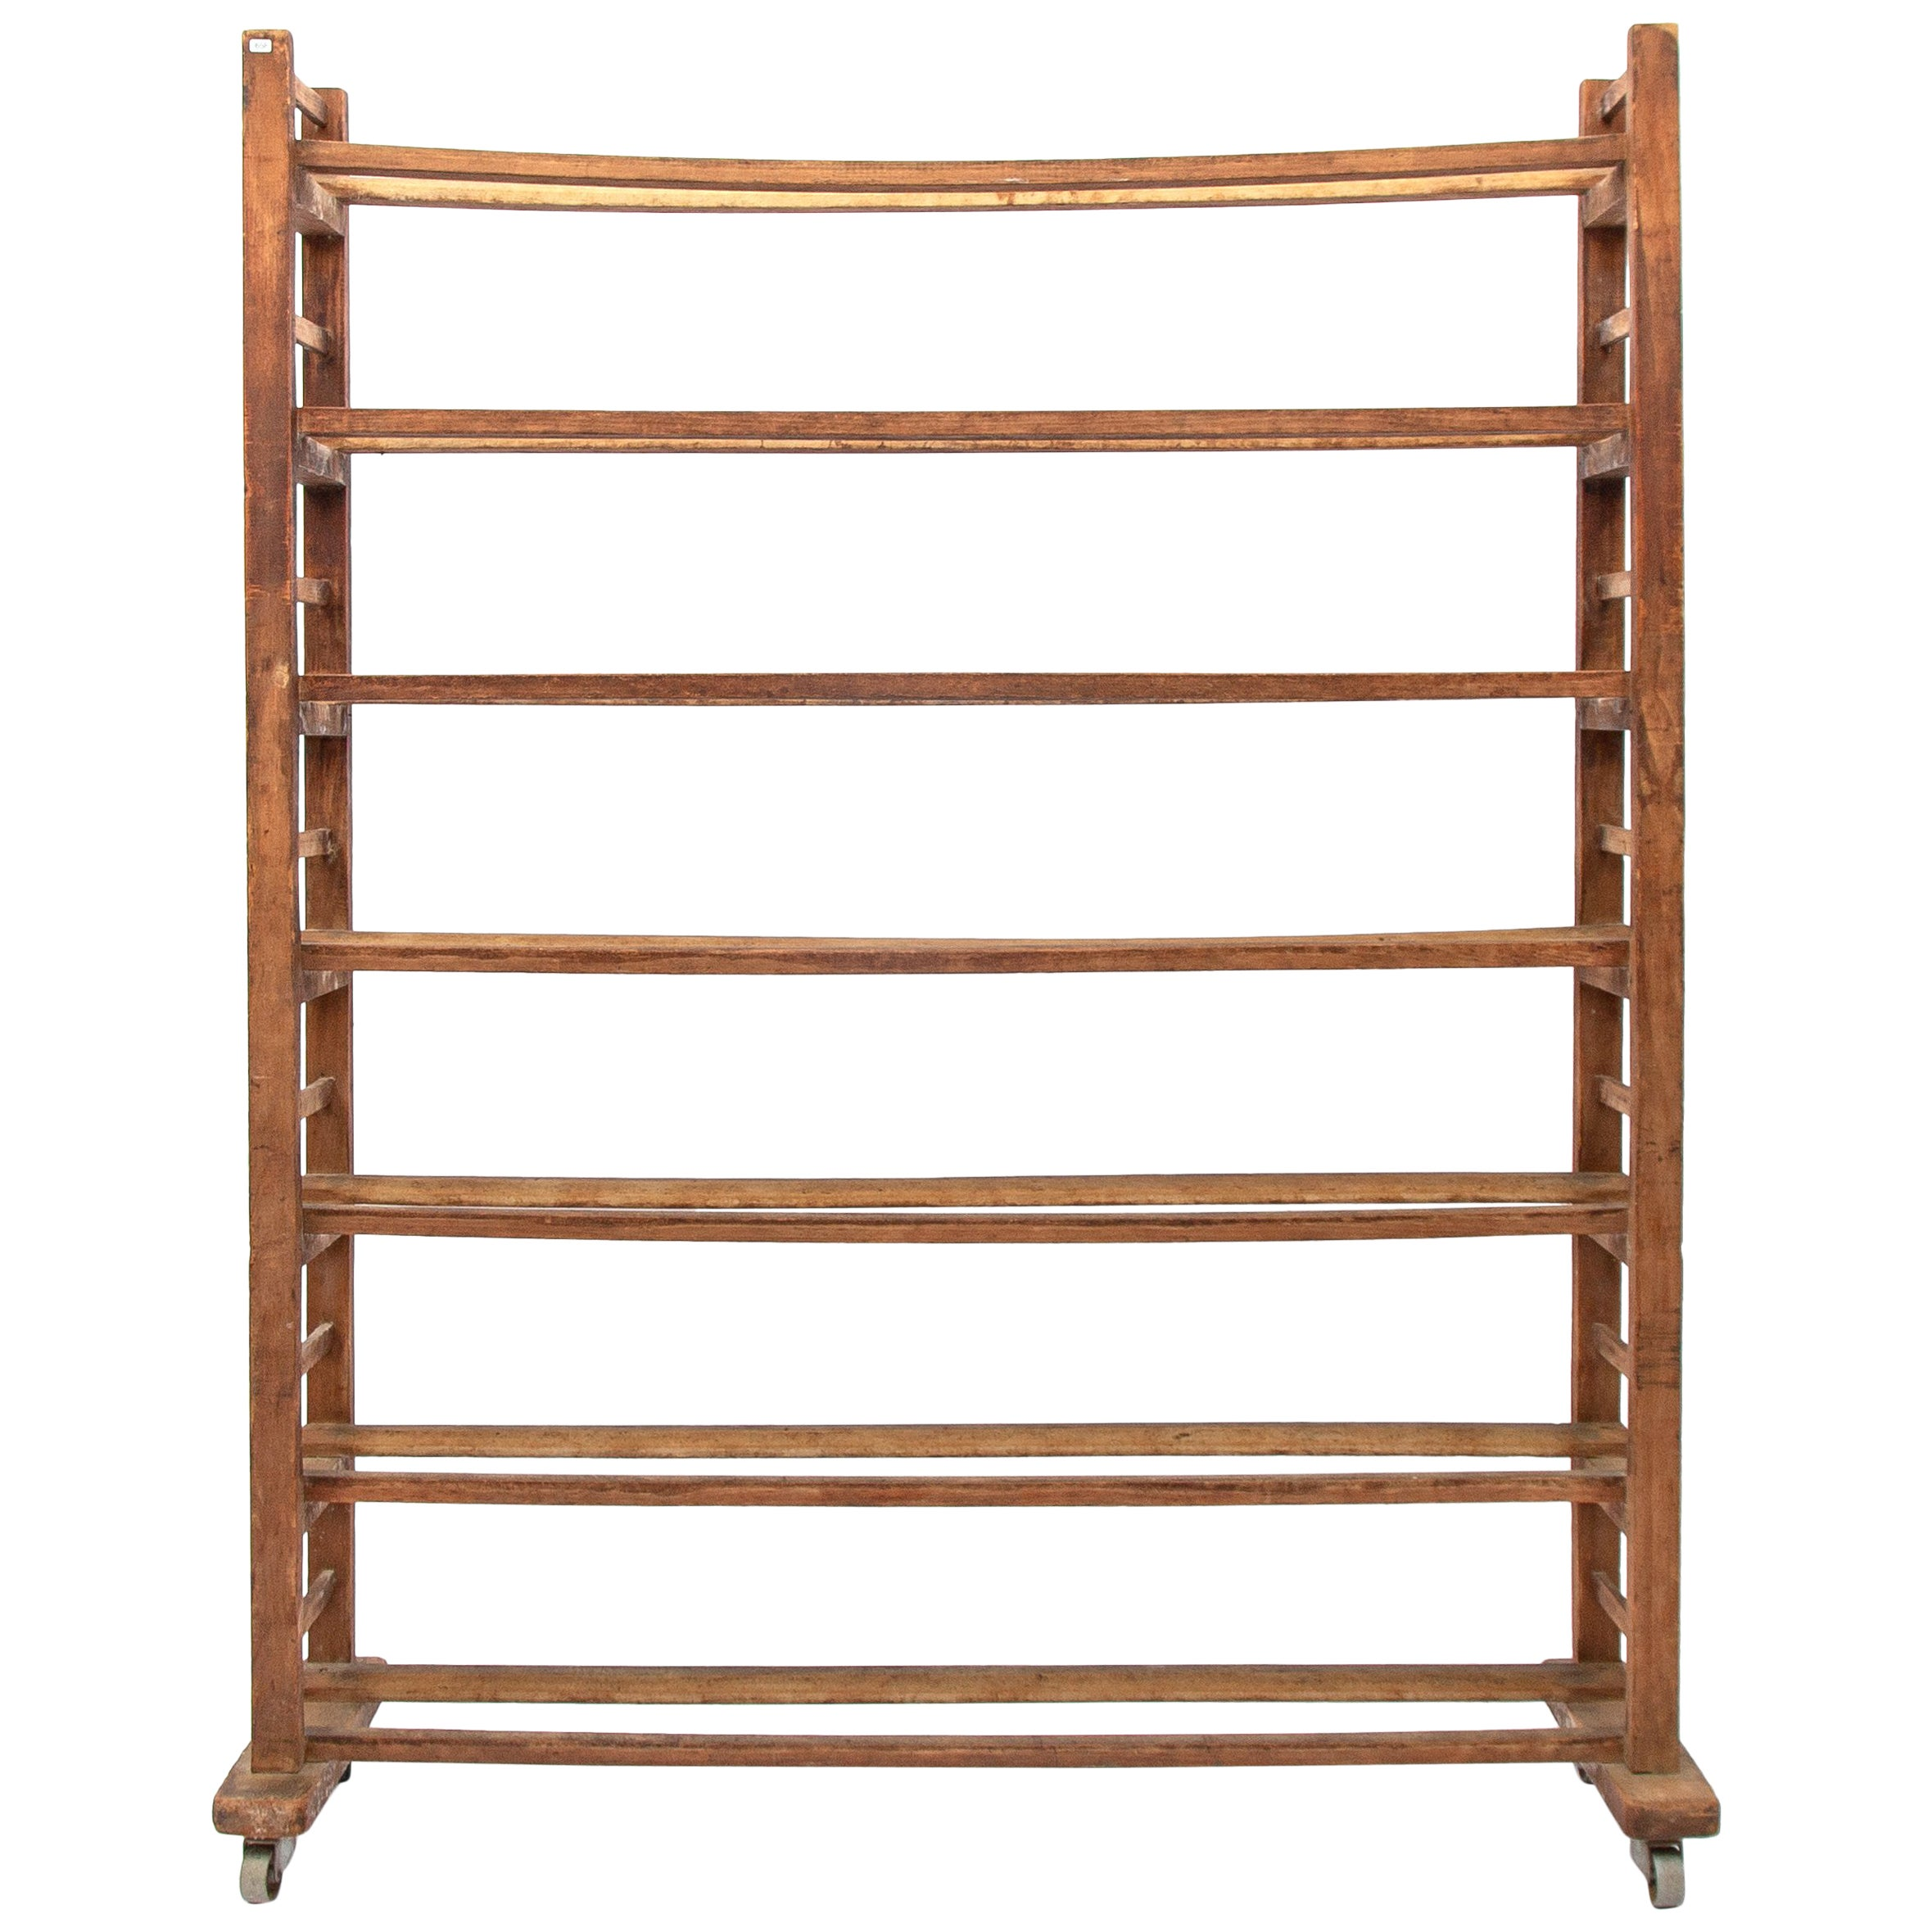 Original Dutch 20th Century Decorative Wooden Seven Shelf Bread Rack